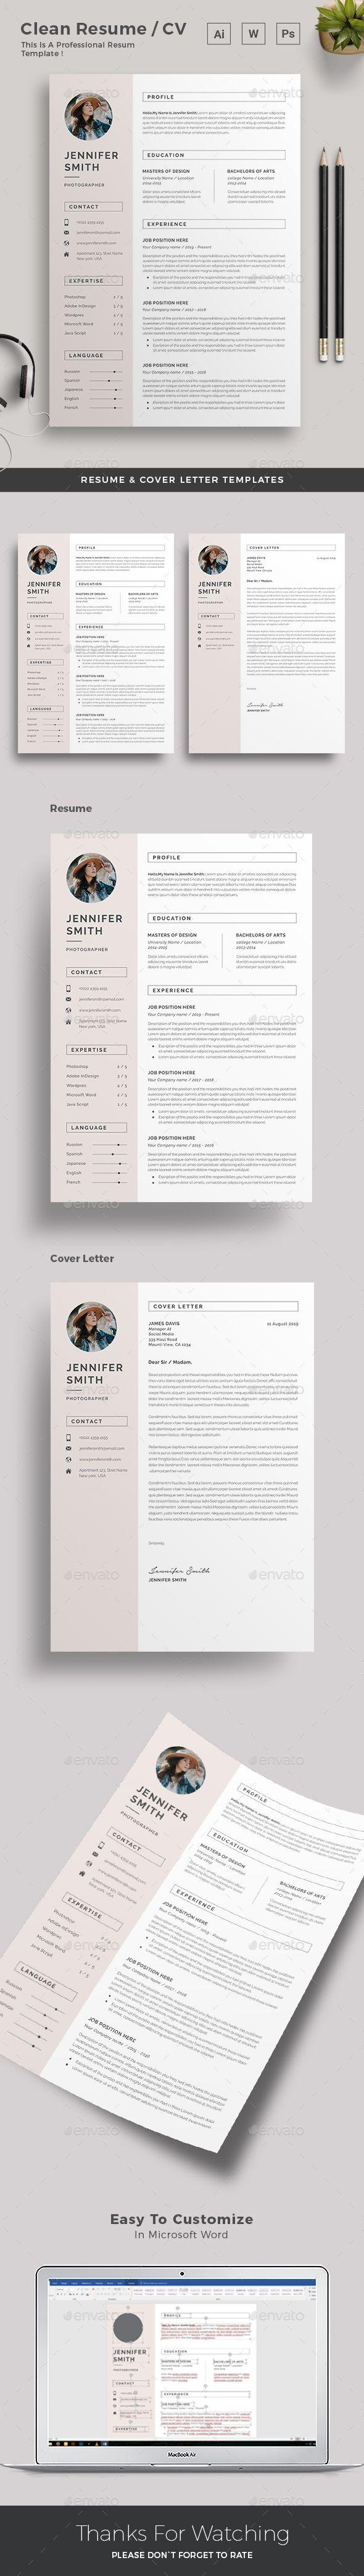 Resume #resume word #feminine • Download ➝ https://graphicriver.net/item/resume/21368771?ref=pxcr